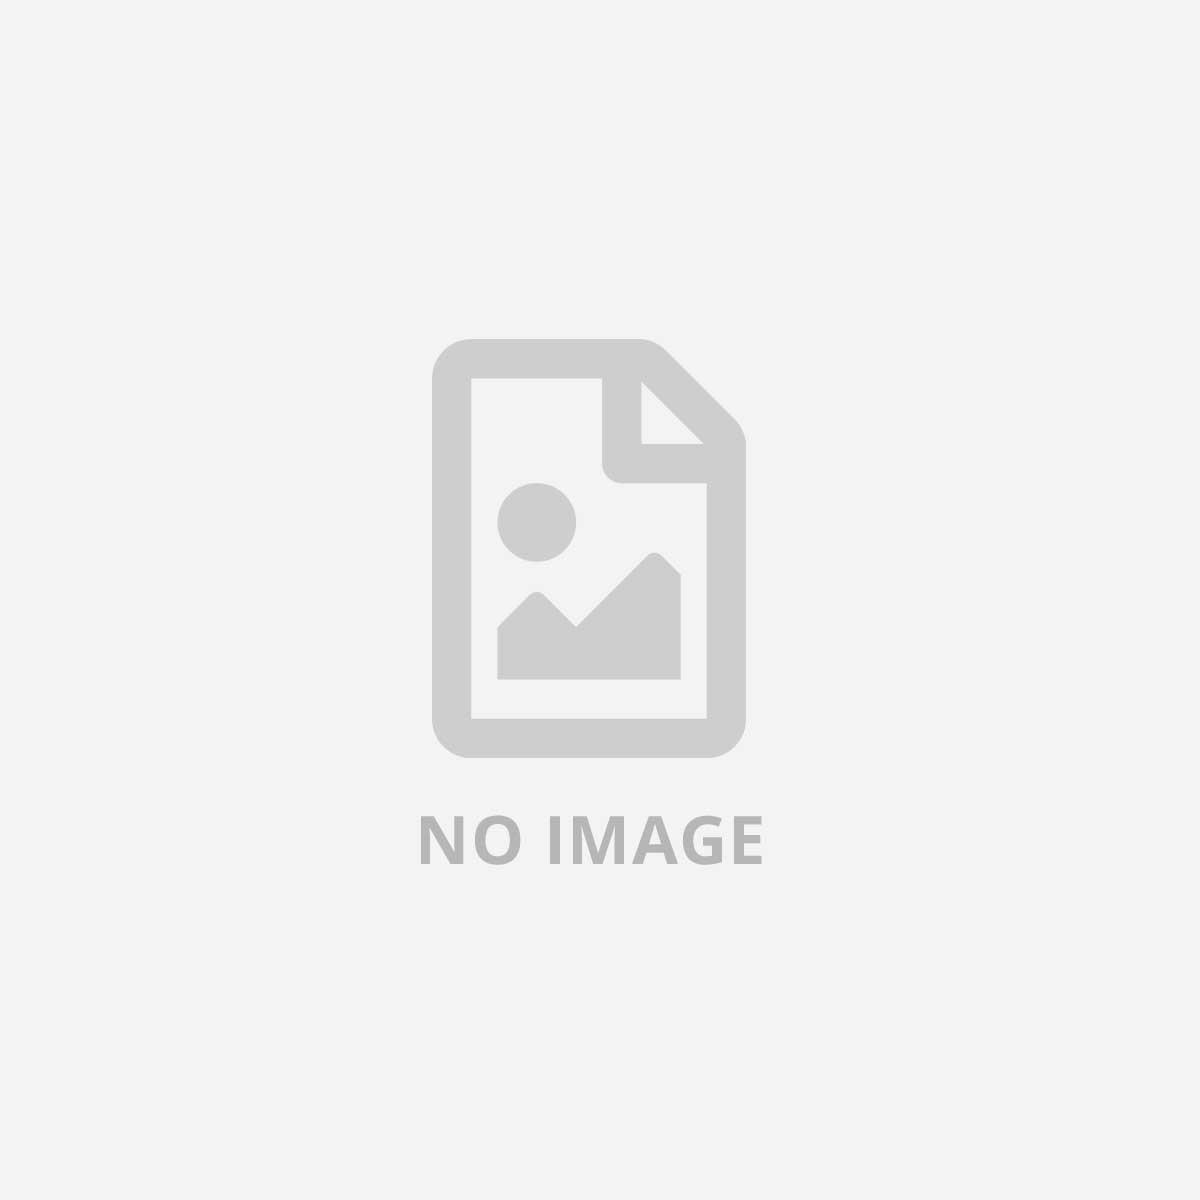 NETGEAR SW 48P 10/100/1000 MBPS + 4 SFP